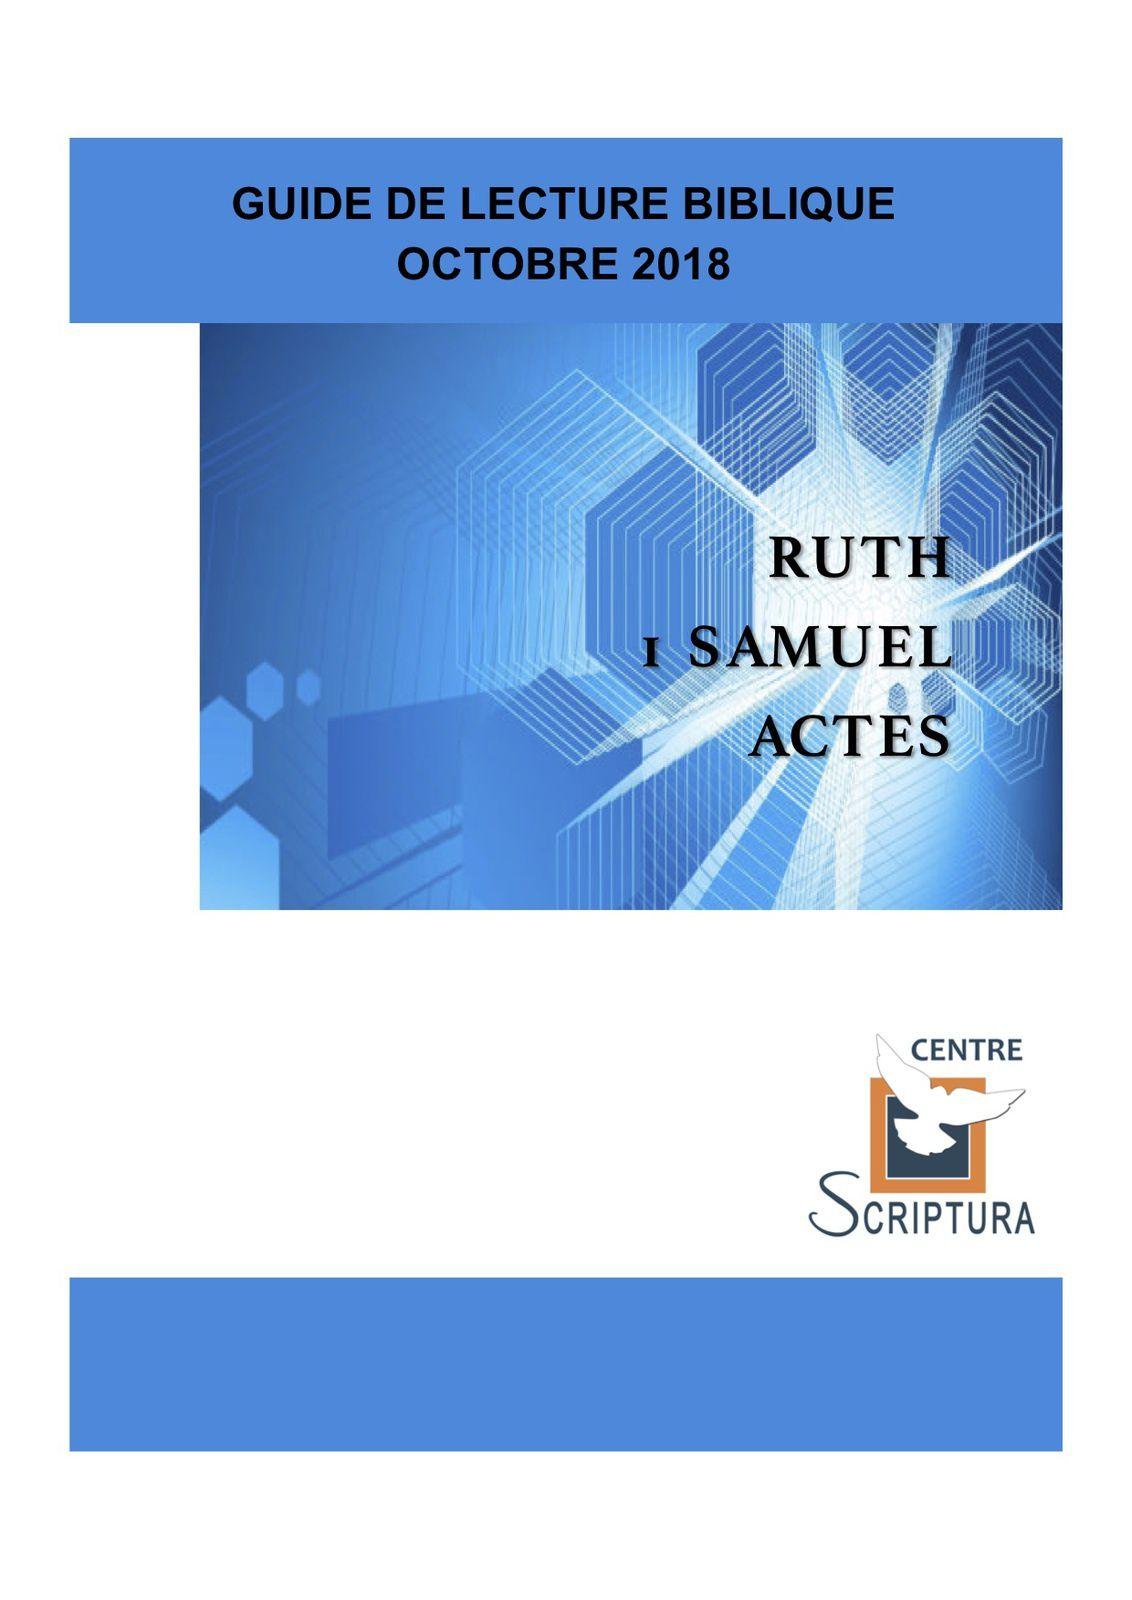 Guide de lecture Biblique Octobre 2018